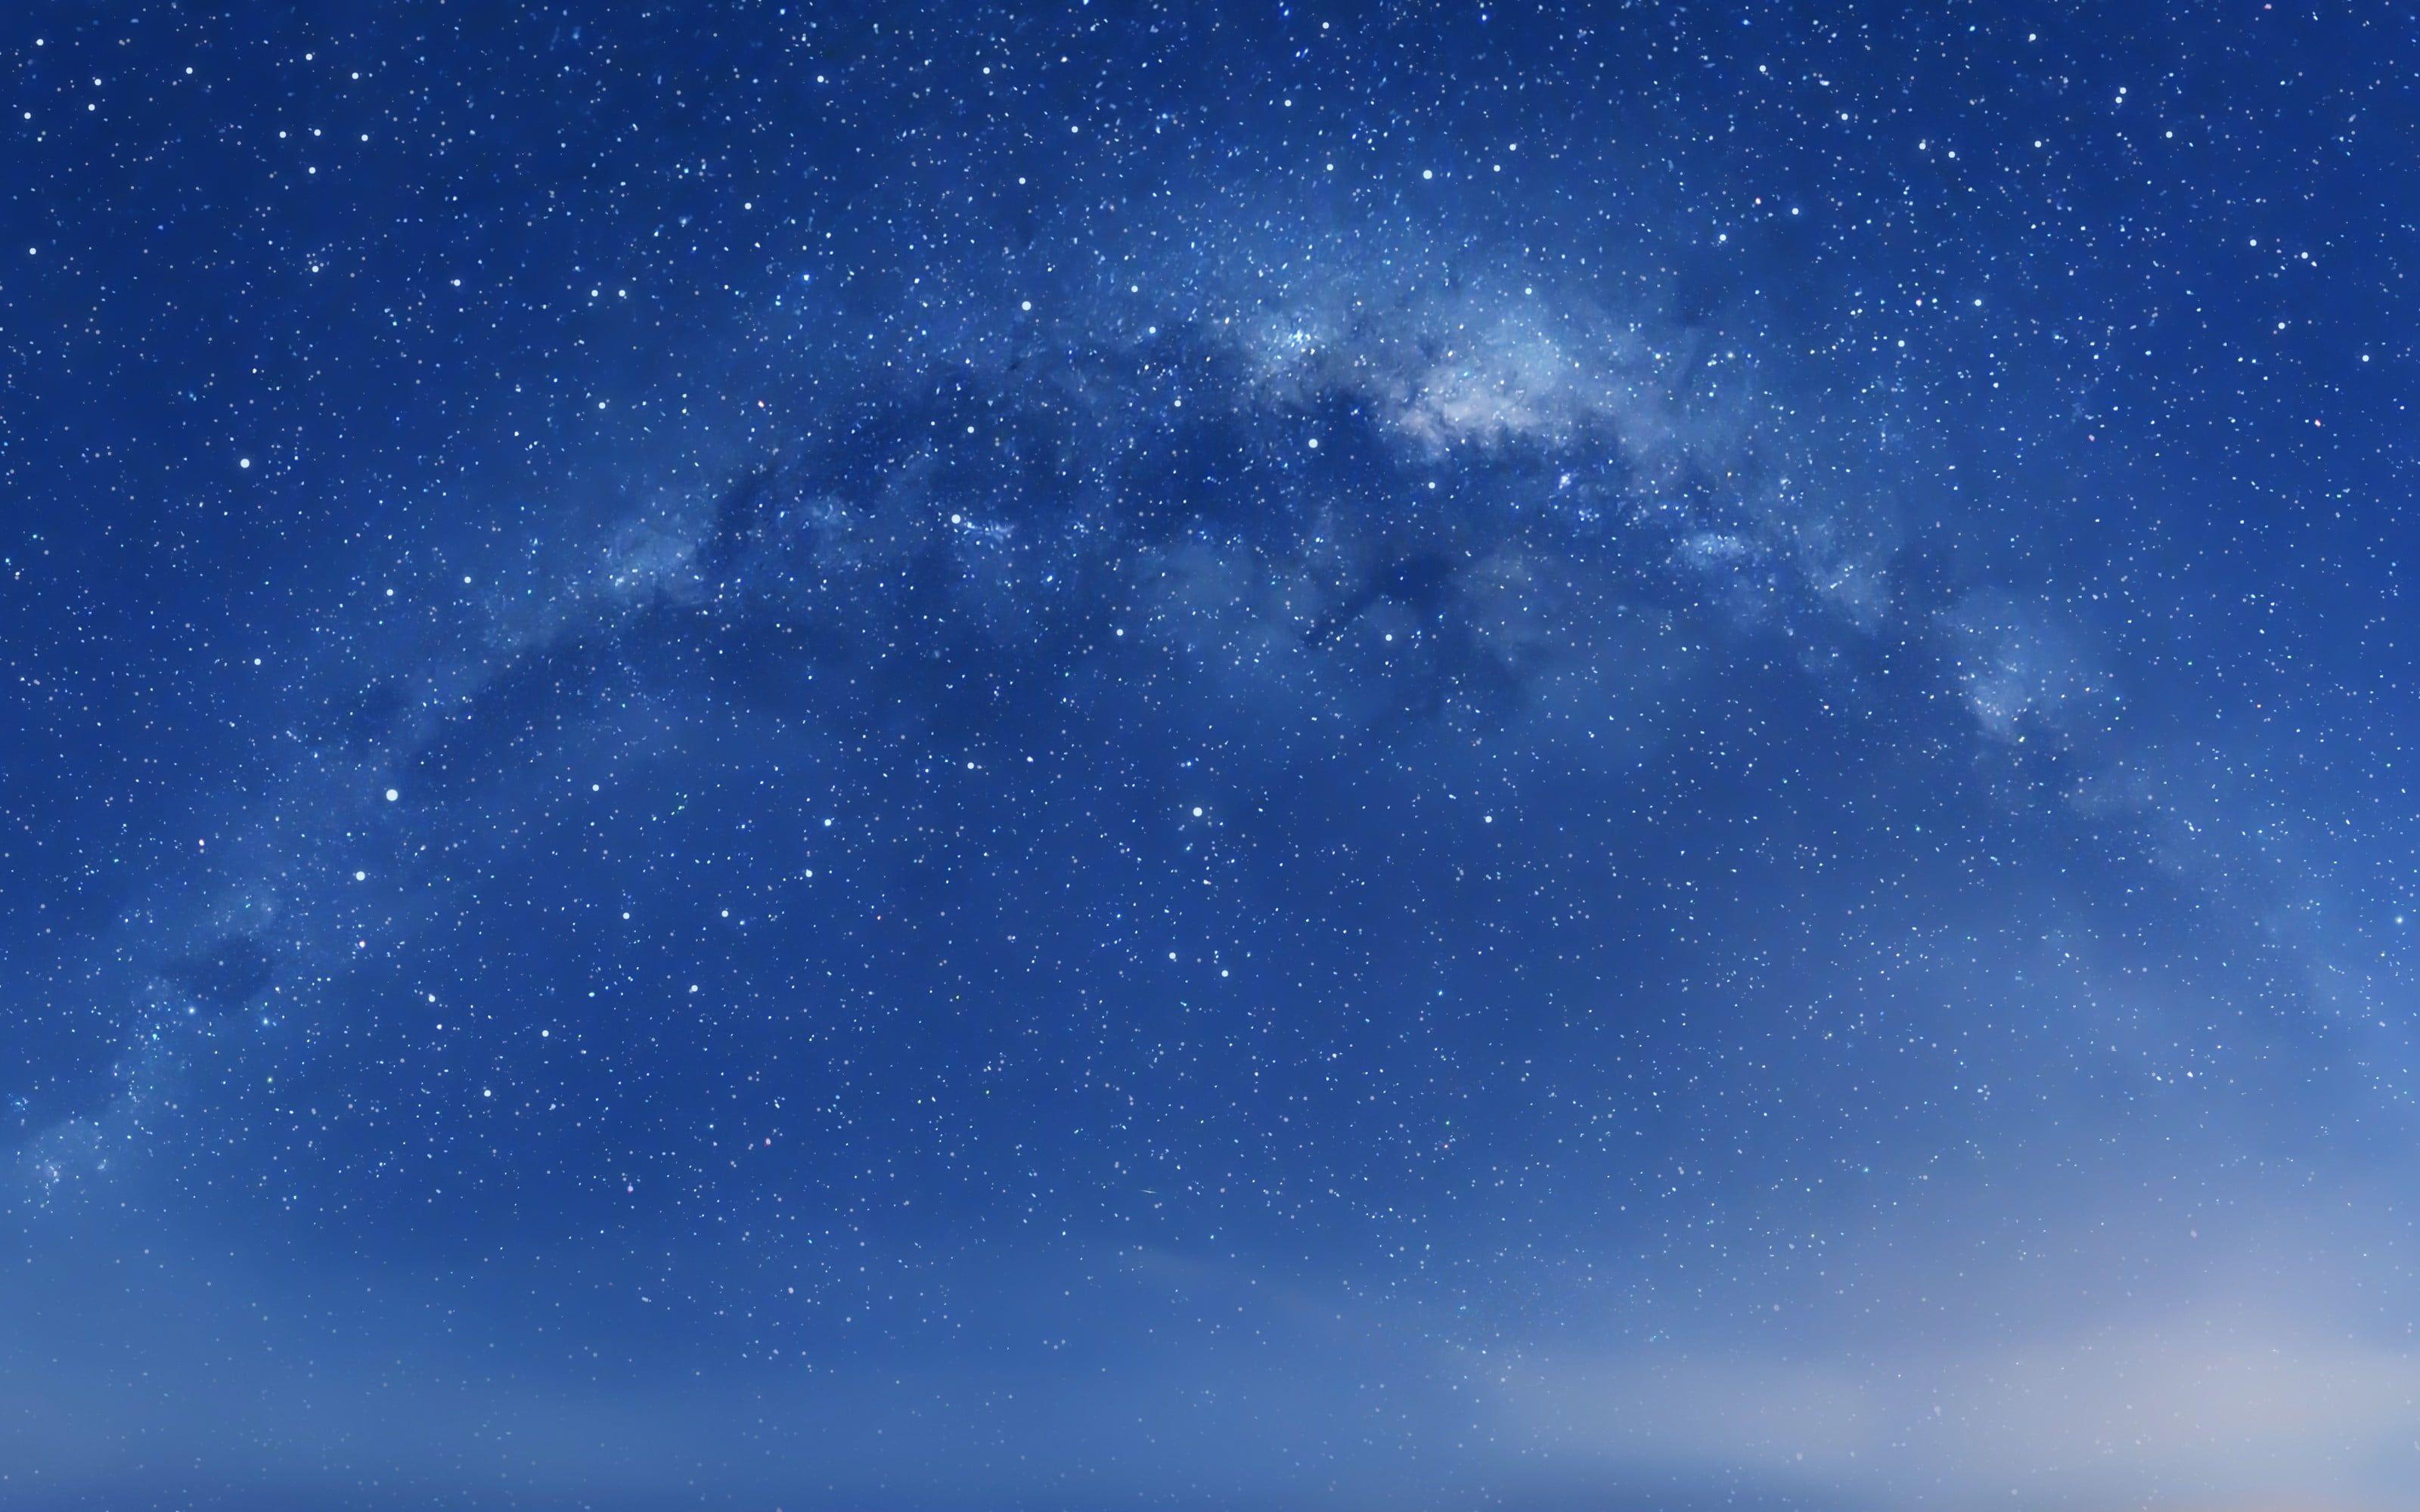 Blue Cloudy Sky With Stars Illustration Space Art Space Digital Art Stars 2k Wallpaper Hdwallpaper Deskt Retina Wallpaper Mac Wallpaper Android Wallpaper